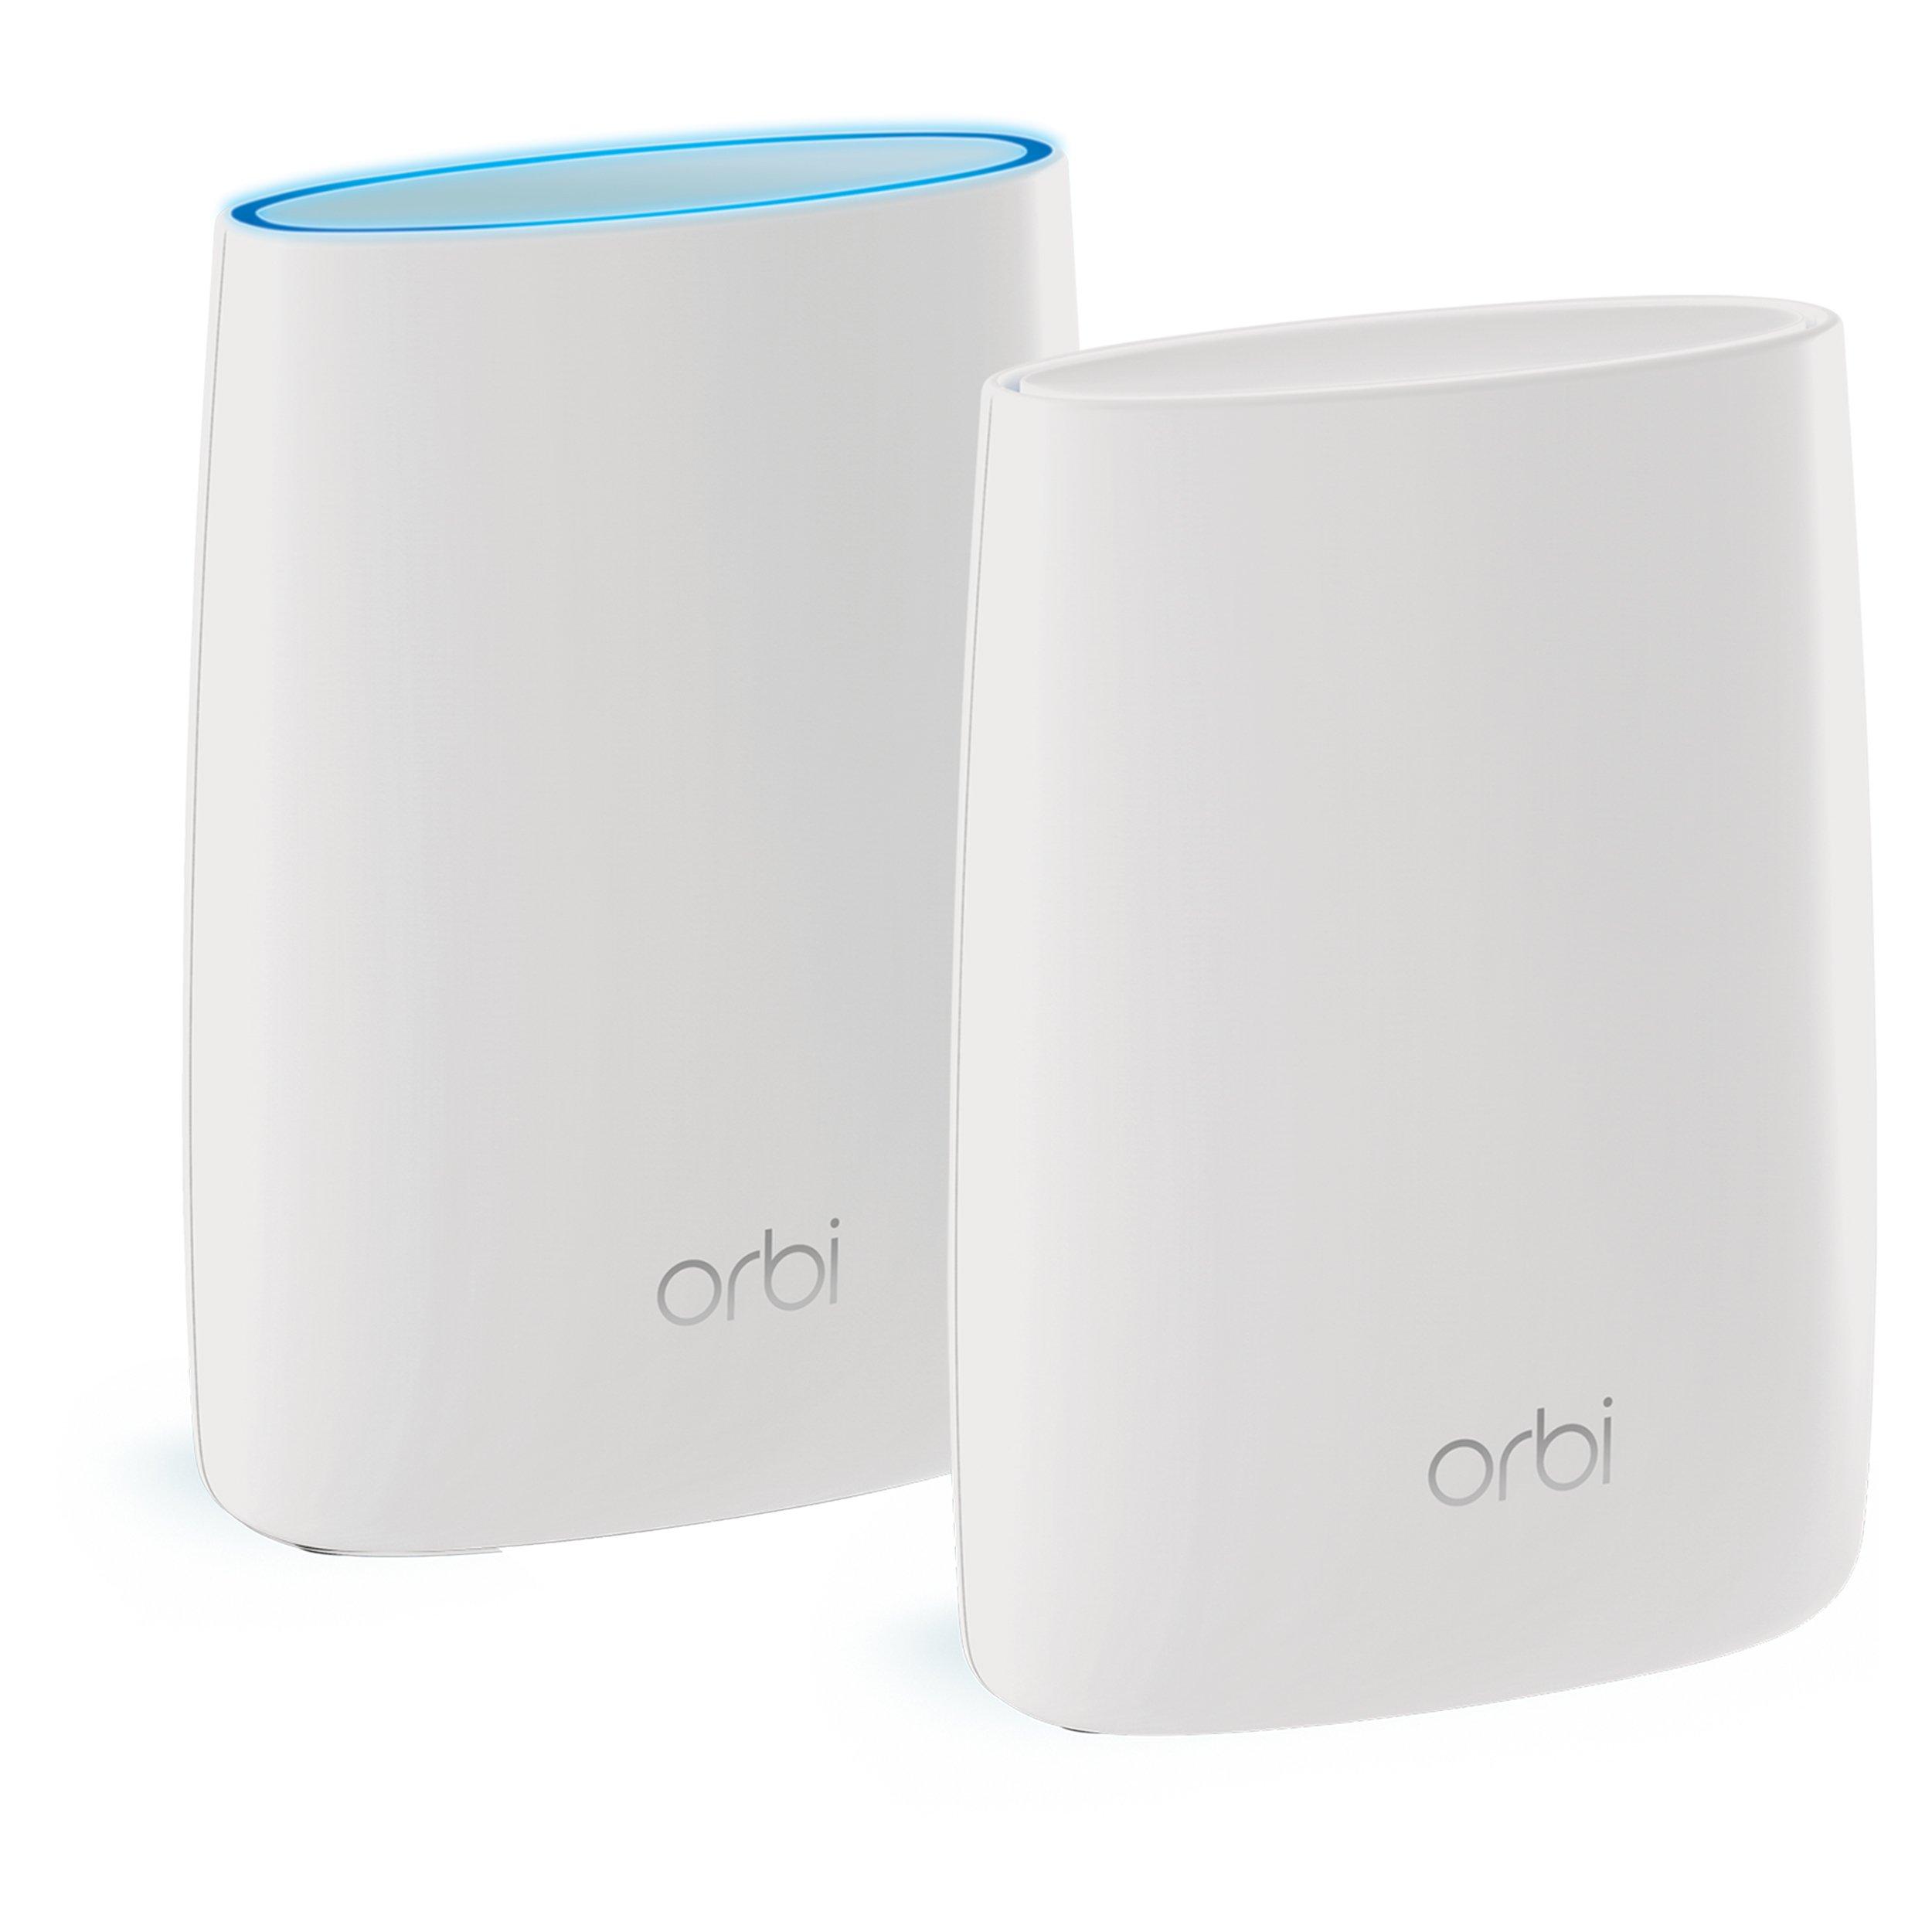 Netgear RBK50-100NAR Orbi Home Mesh Wi-Fi System (Certified Refurbished)